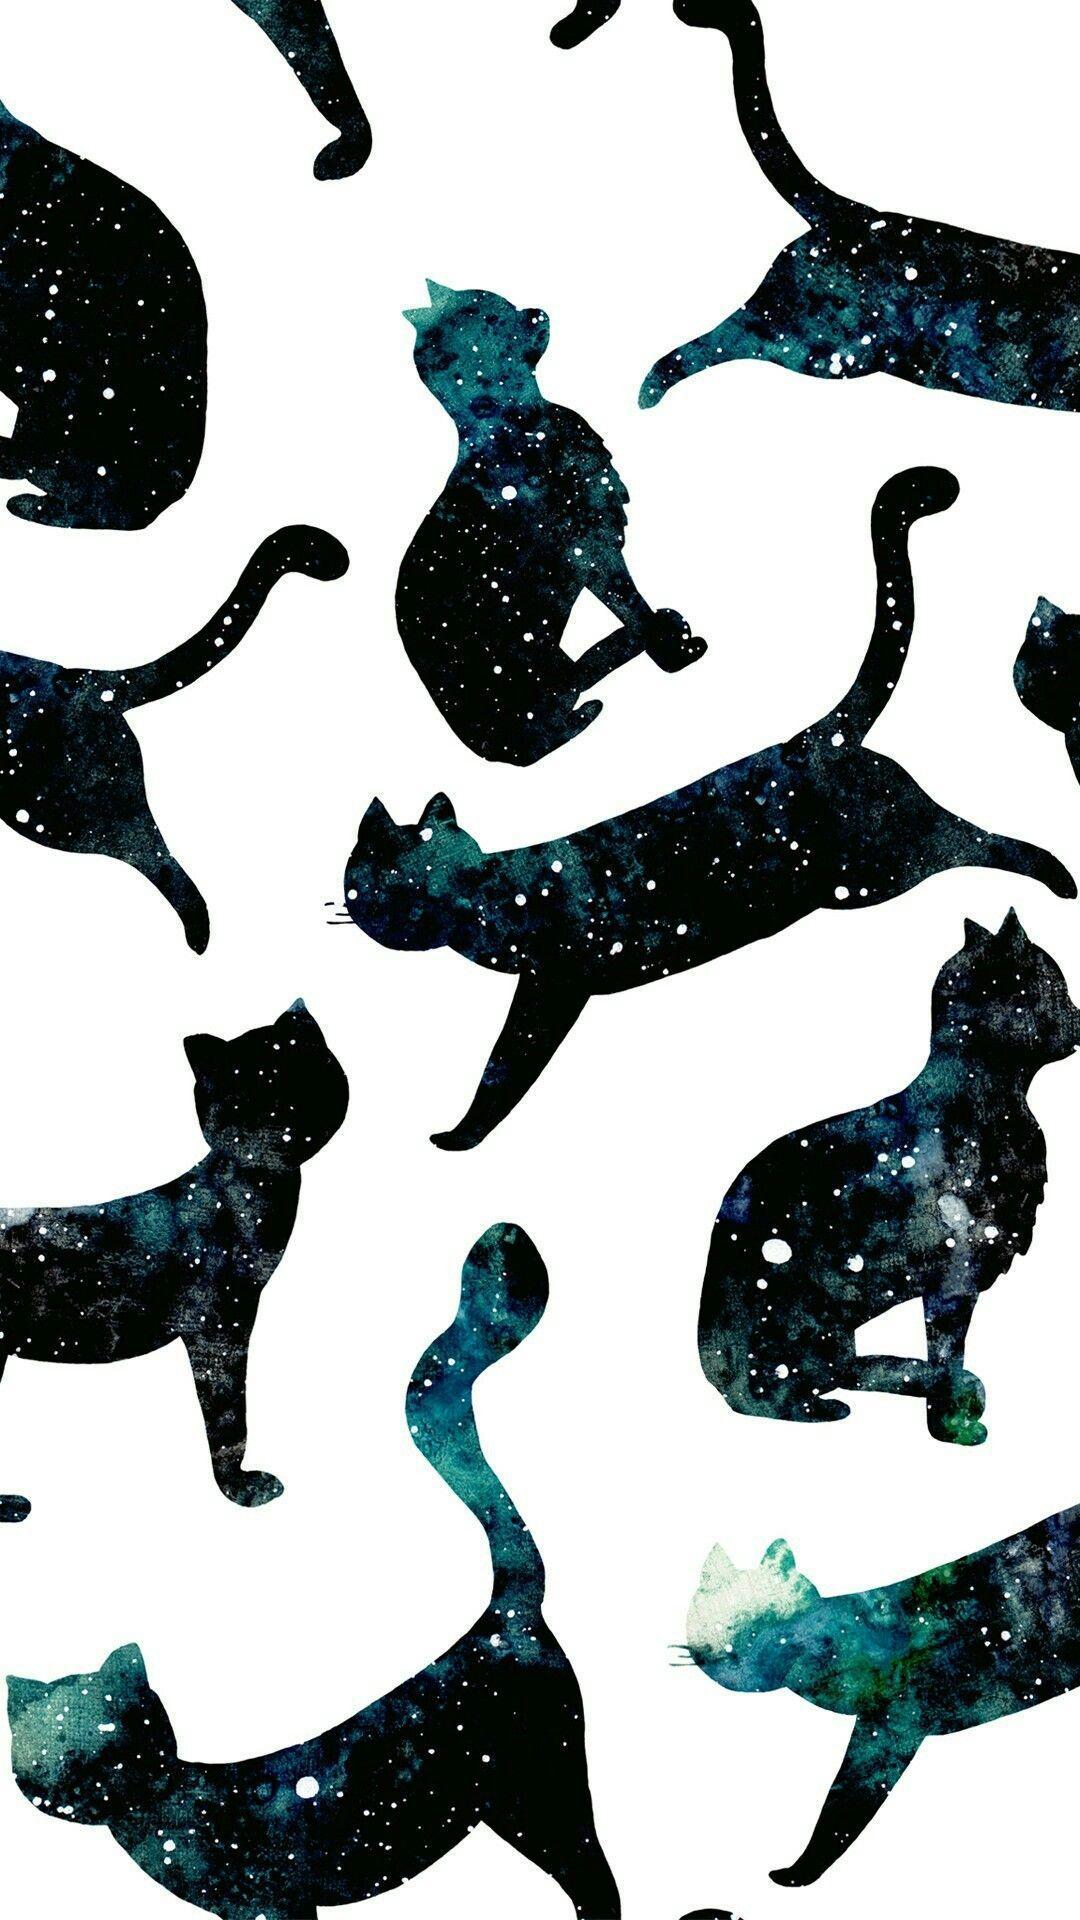 Cat Wallpaper Tumblr Iphone